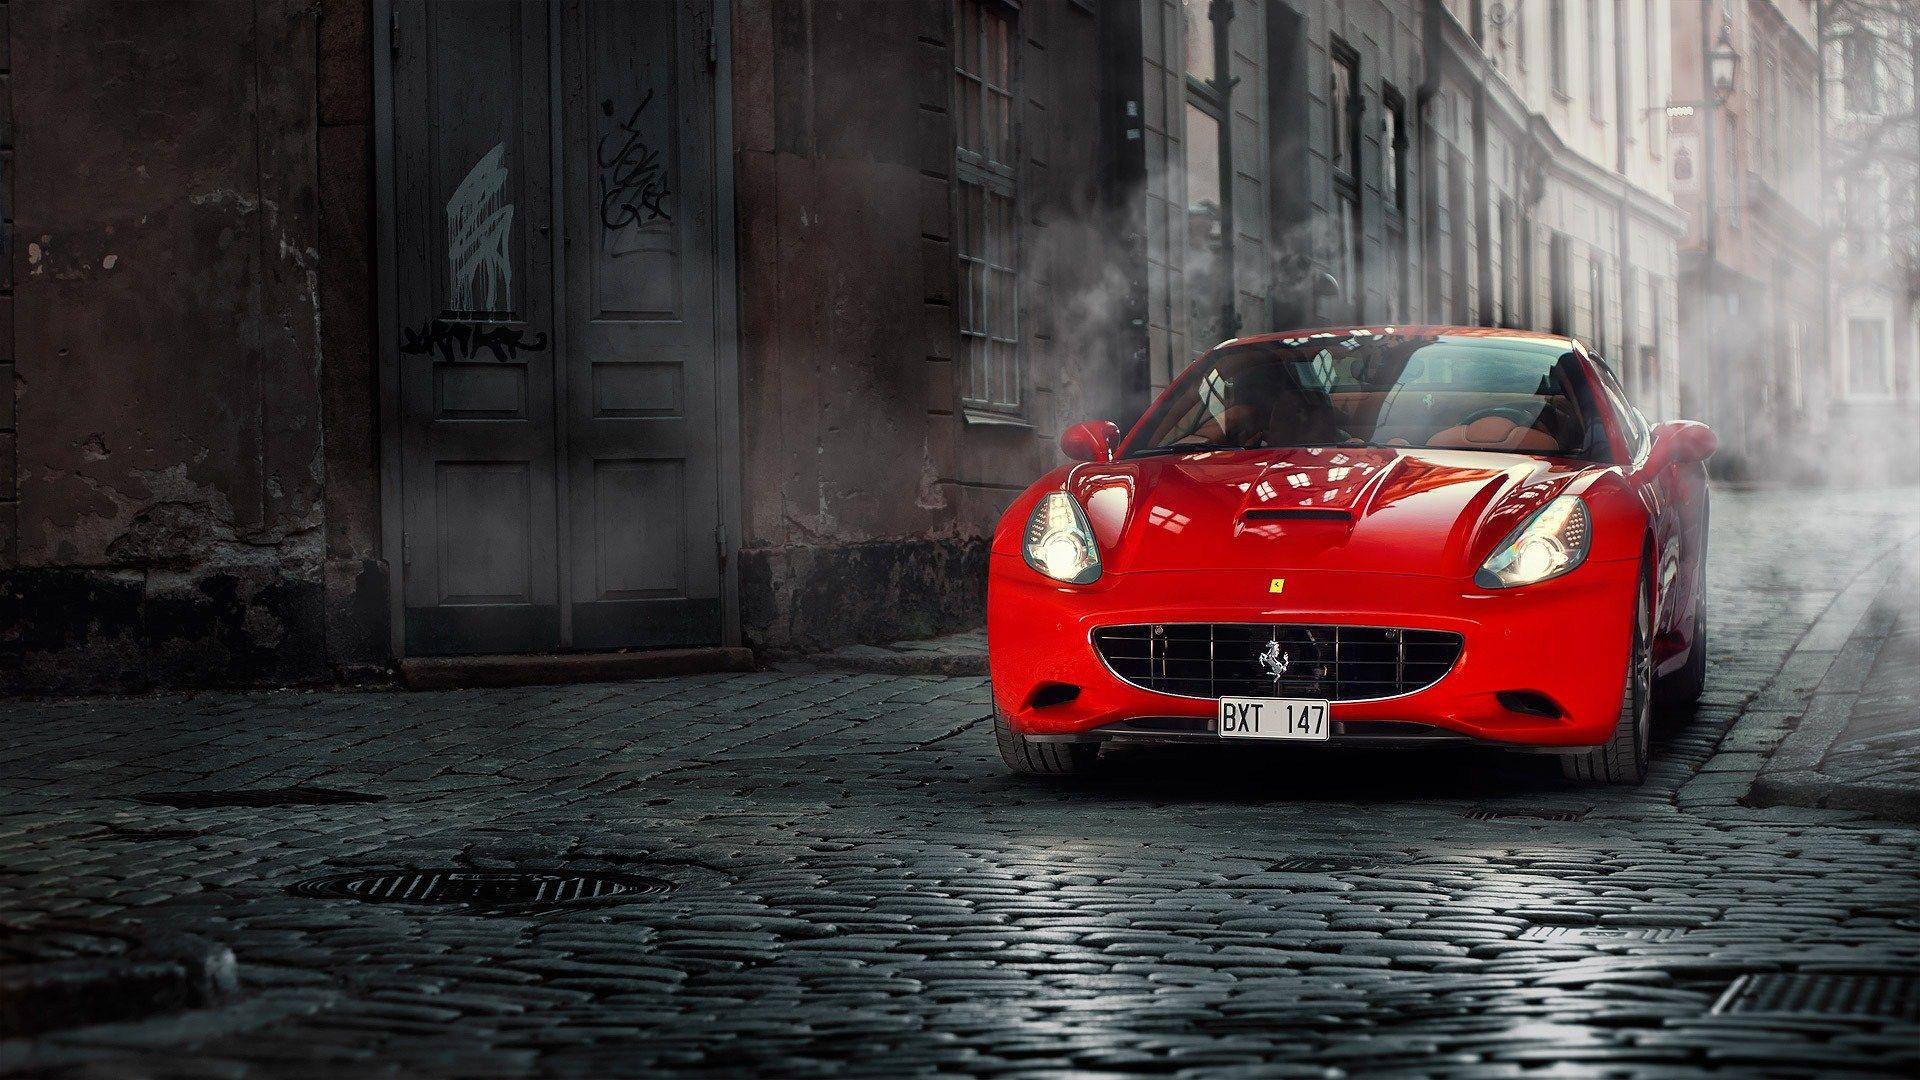 Red Ferrari Wallpaper 36330 1920x1080 Px Hdwallsource Com Ferrari California Ferrari Ferrari Car